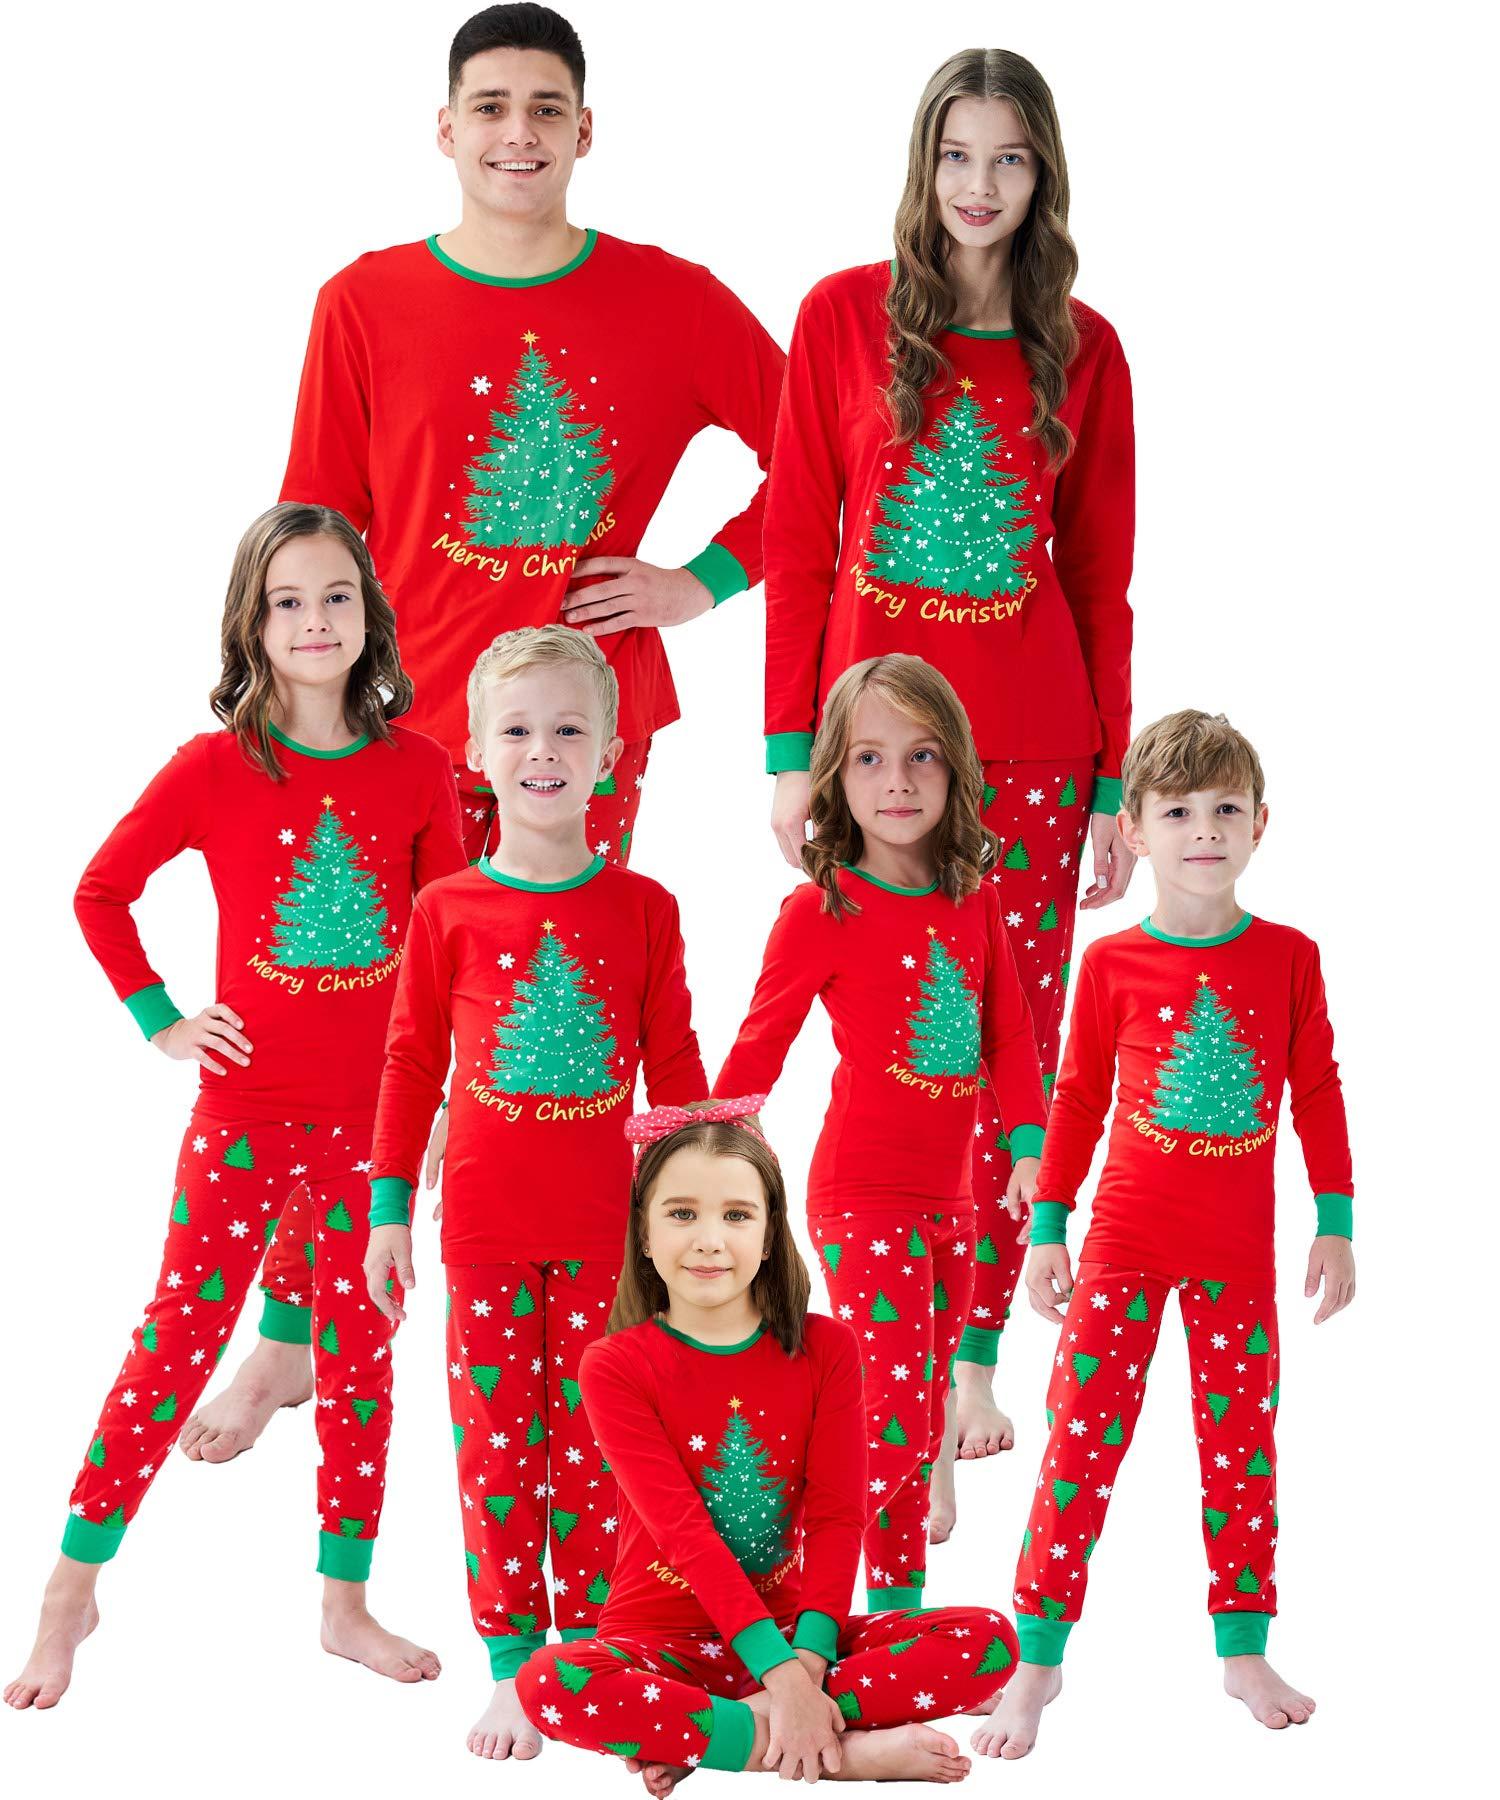 Family Matching Christmas Pjs Christmas Tree Boys Girls Pajamas Kids Sleepwear Size 10 Red by Dolphin&Fish